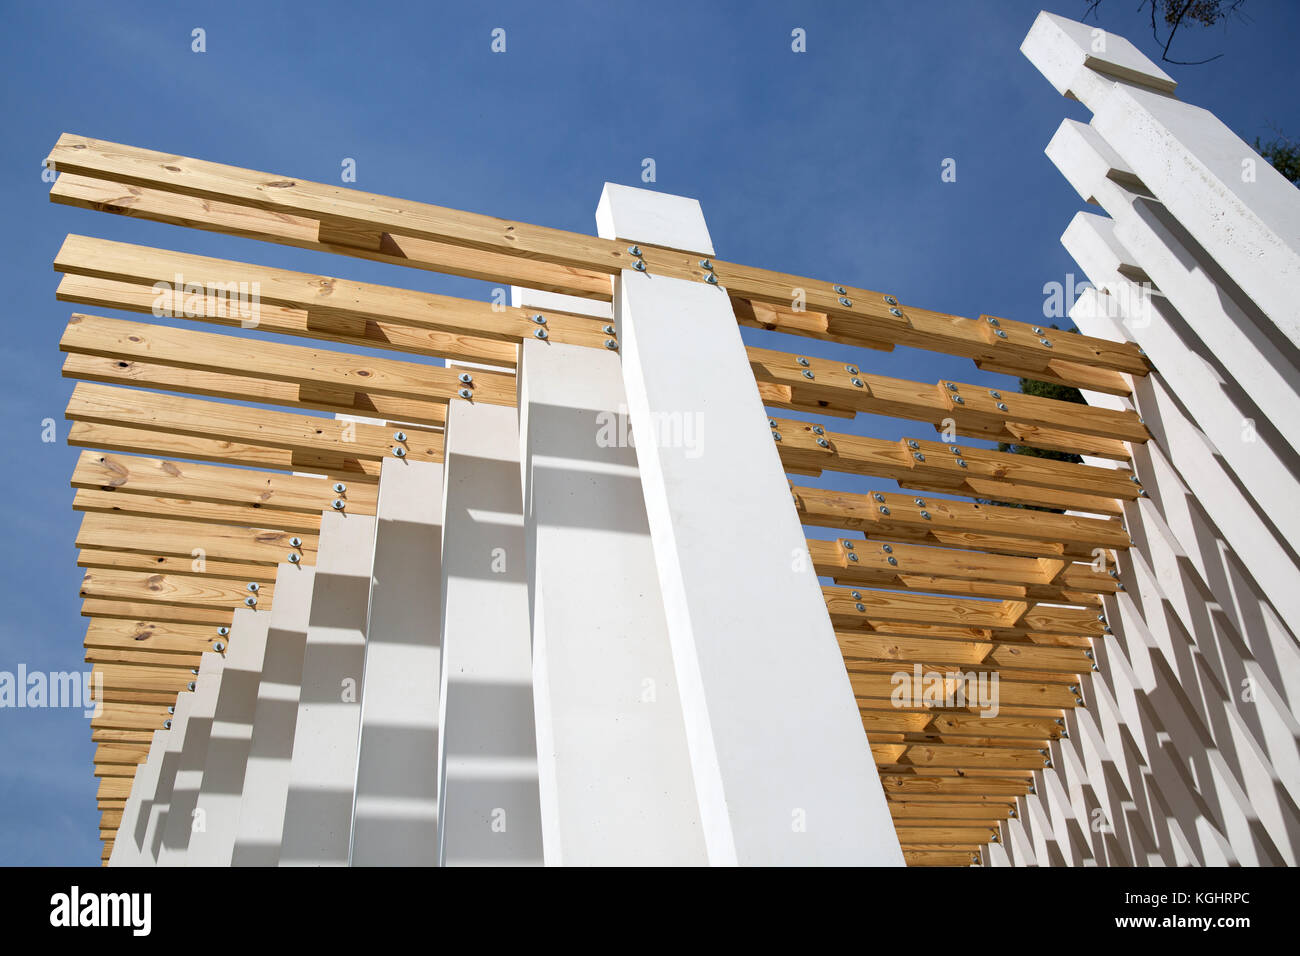 Estudio de arquitectura mexicana mat ria dise ado tamayo for Estudio de arquitectura en ingles